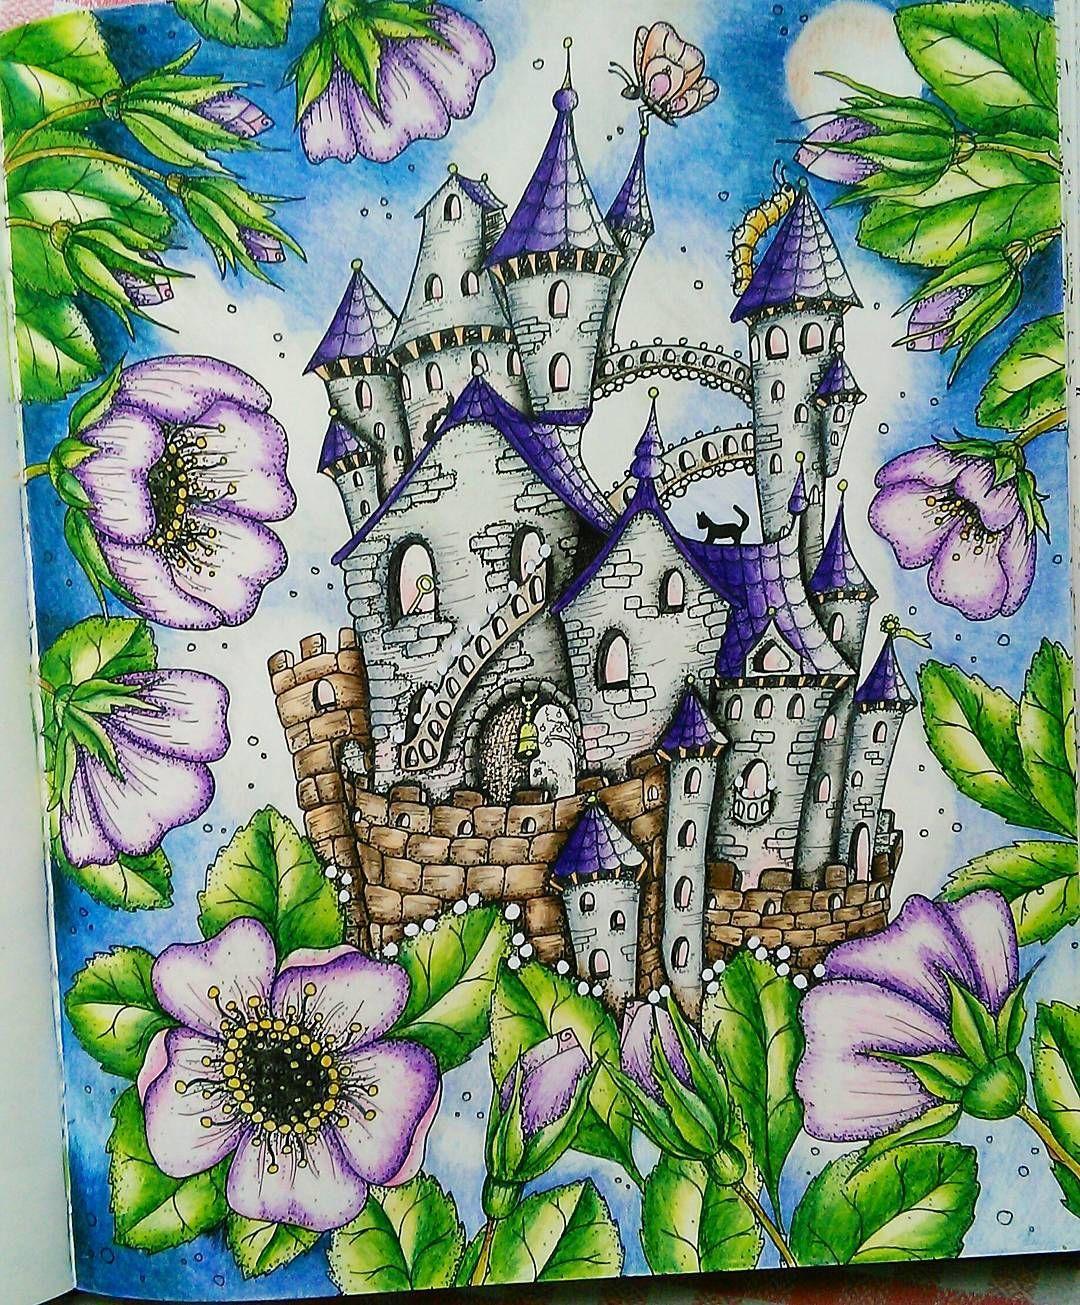 #antistress #antistresoveomalovanky #adultcoloringbook #colourbook #coloringbook #color #omalovanky #klaramarkova #carovnelahodnosti #castle #relax #kohinoor #mondeluz #pastels #wip #workisprogress #magicaldelights #magicaldelightscoloralong